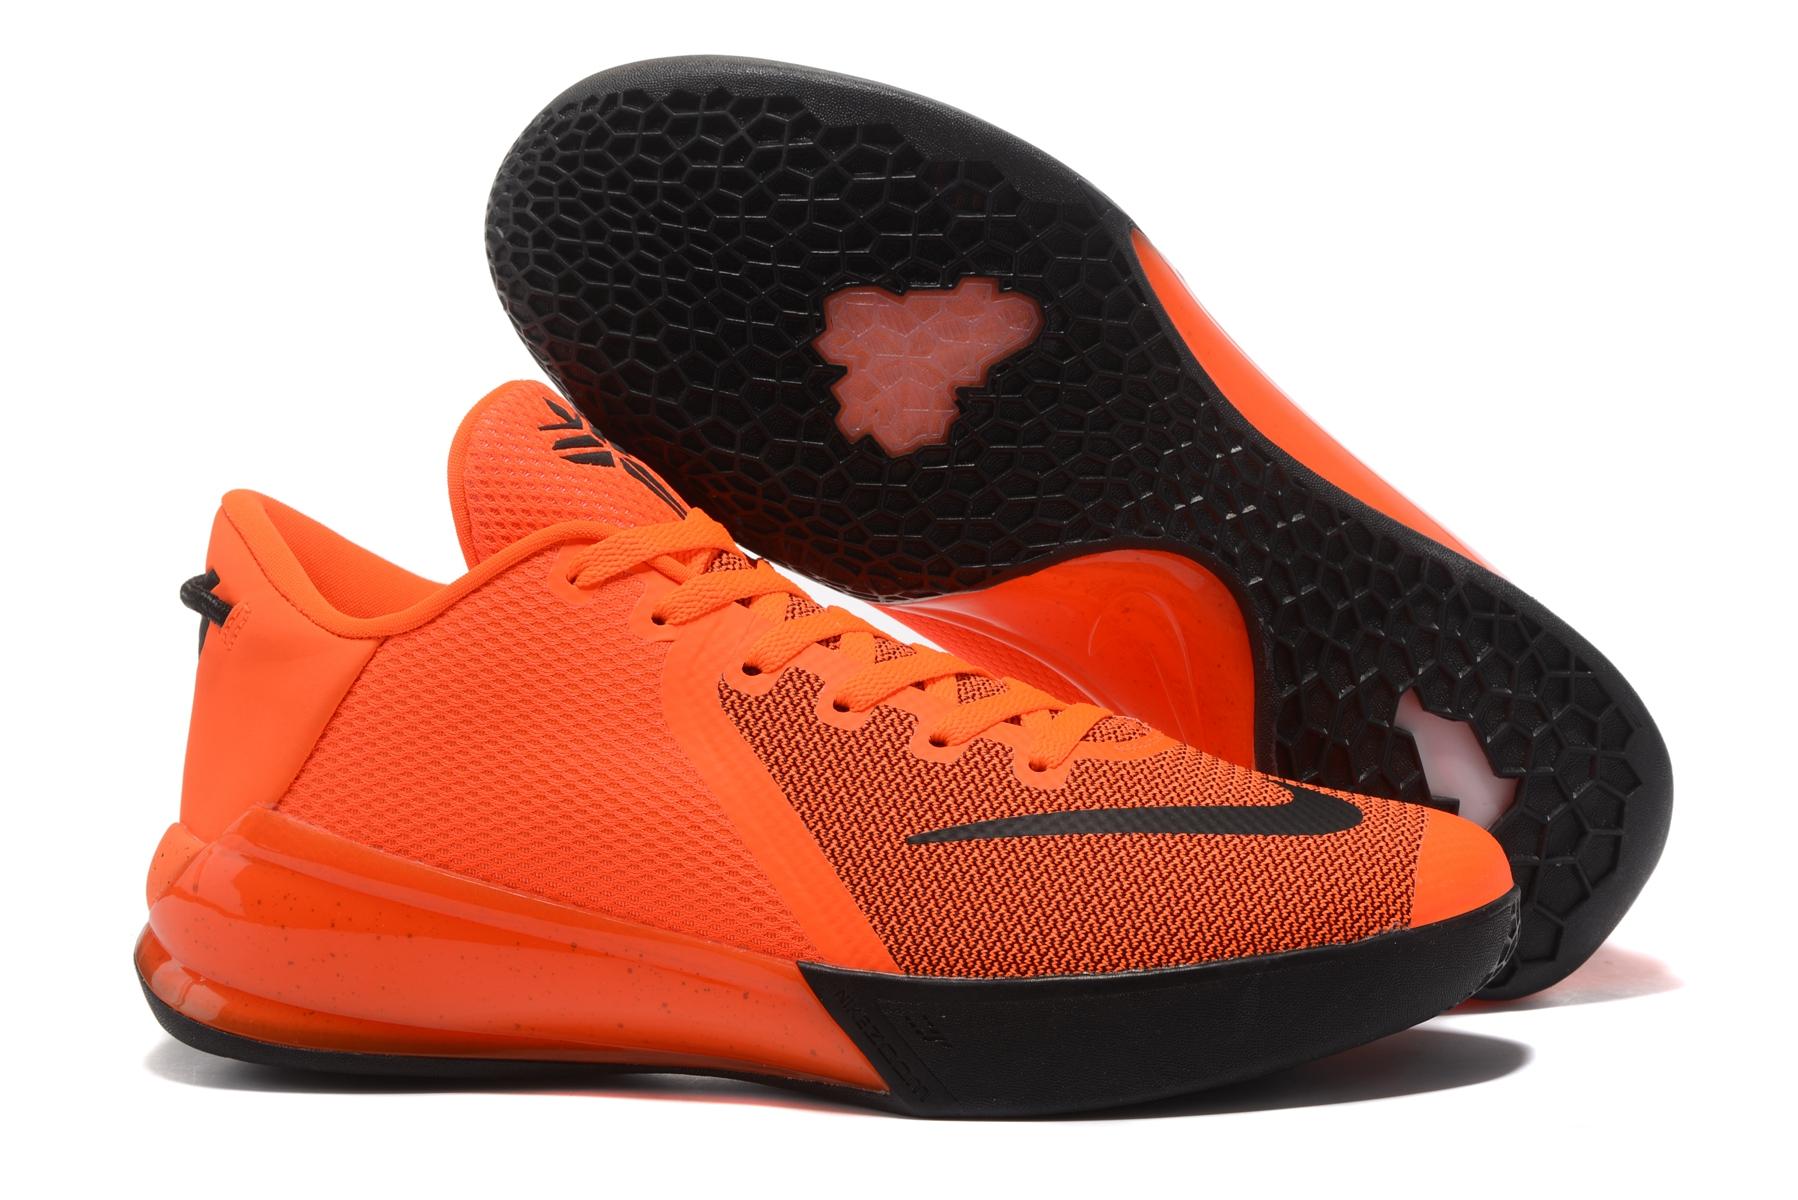 Nike Zoom Kobe Venomenon VI 6 Men Basketball Shoes Orange Black